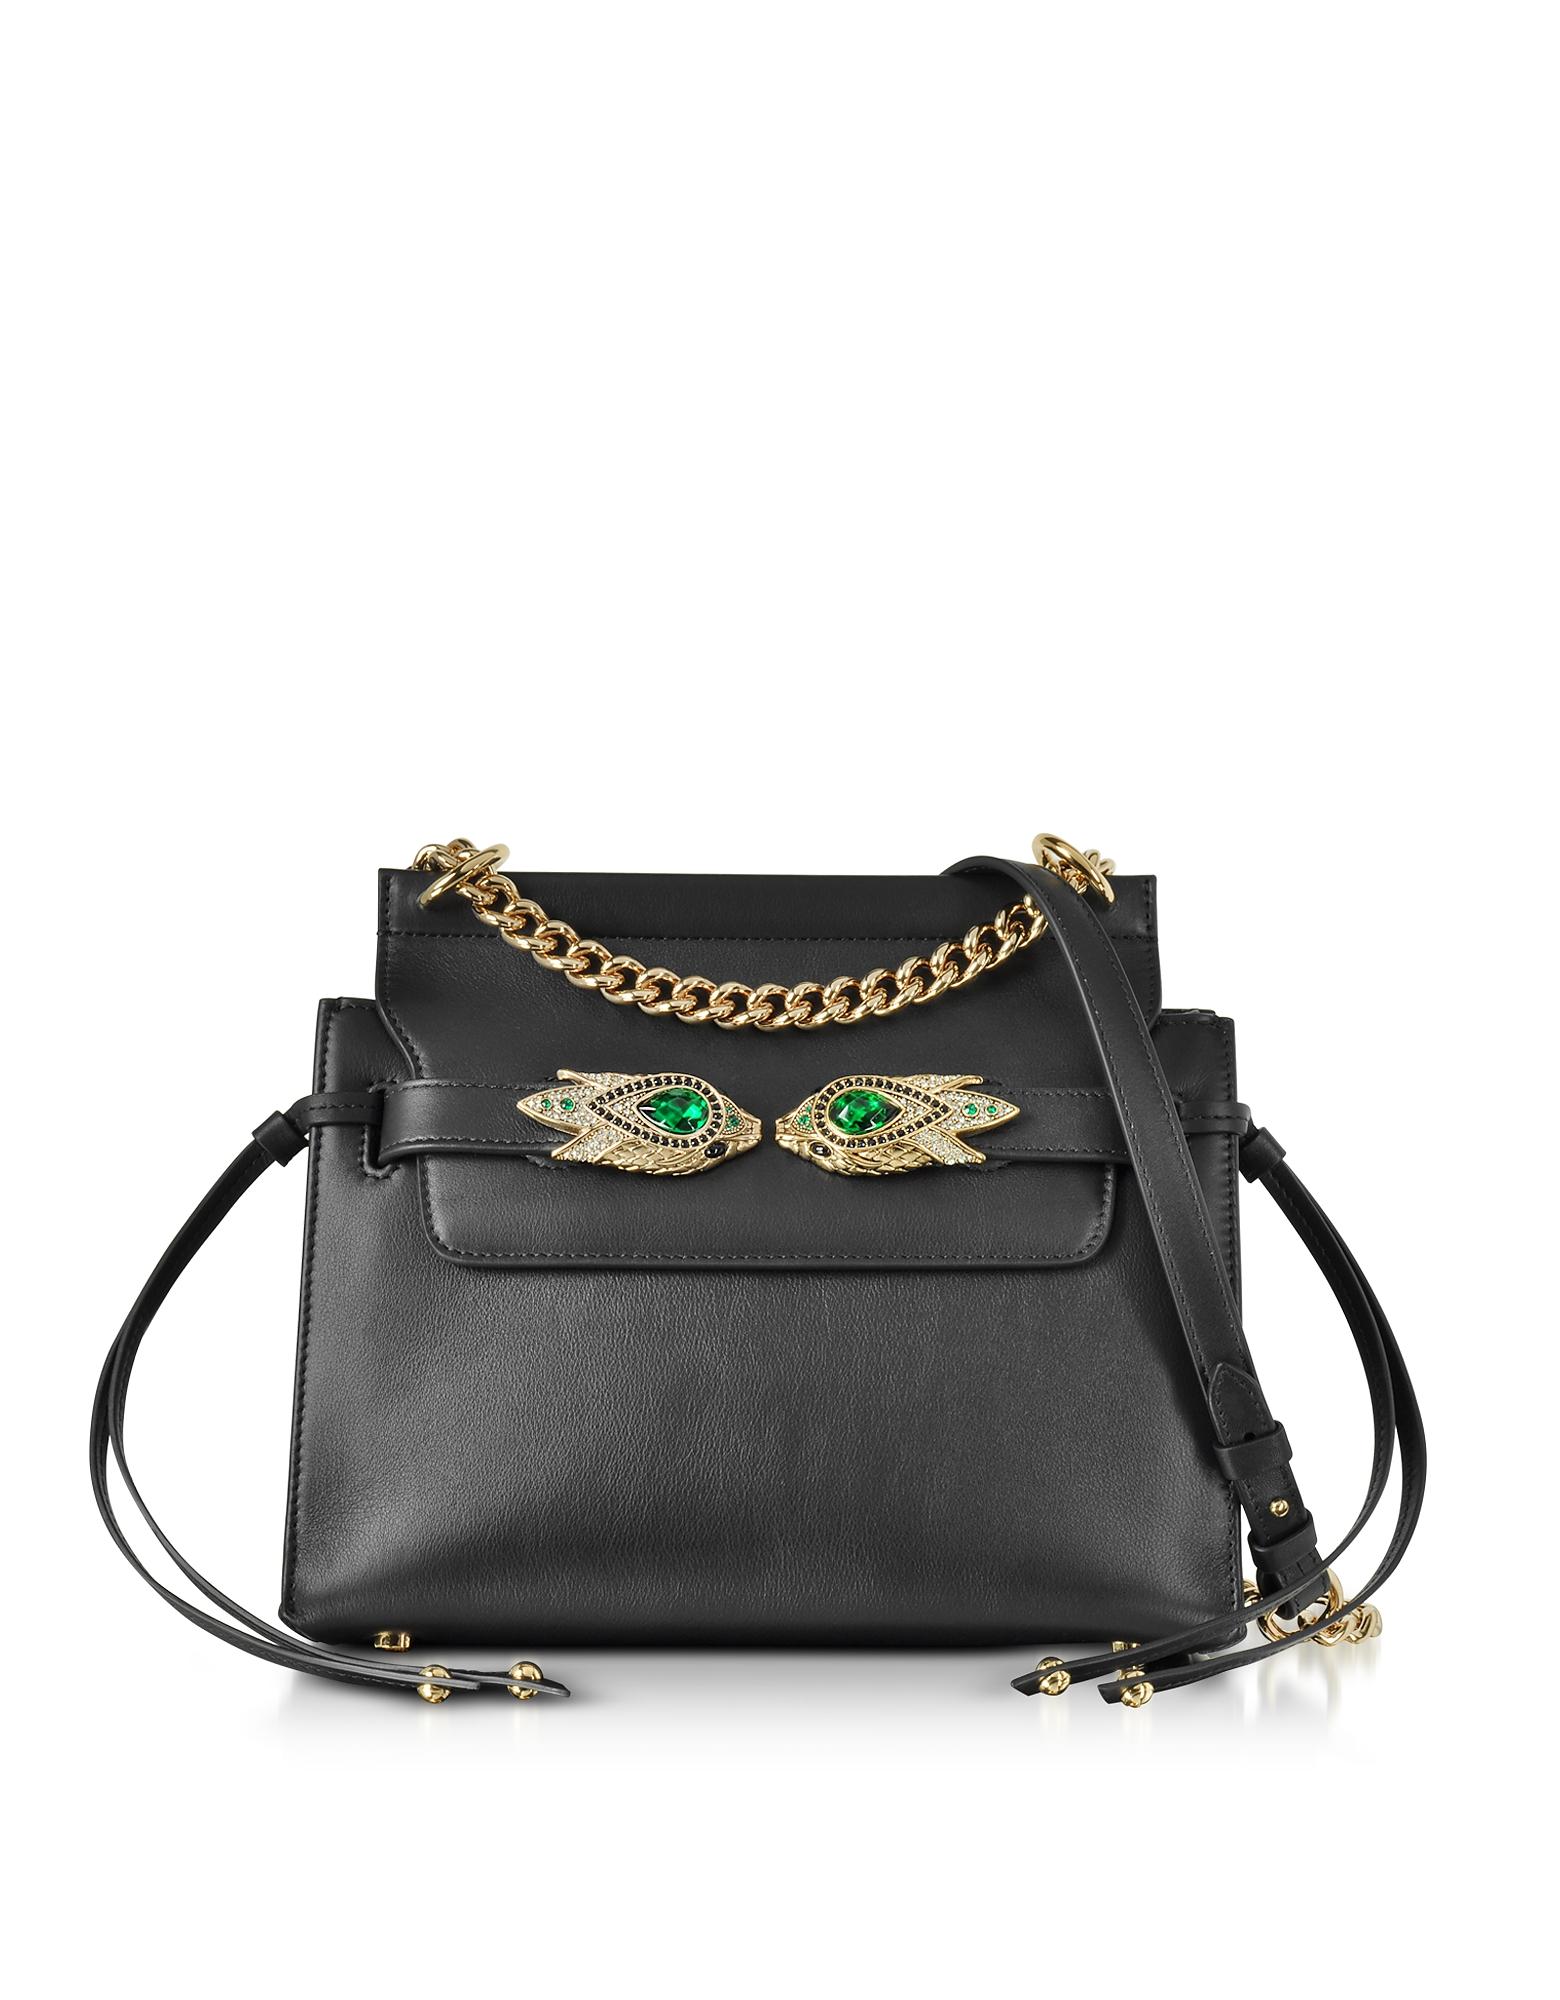 Roberto Cavalli Handbags, Black Leather Shoulder Bag w/Goldtone and Crystals Snake Heads